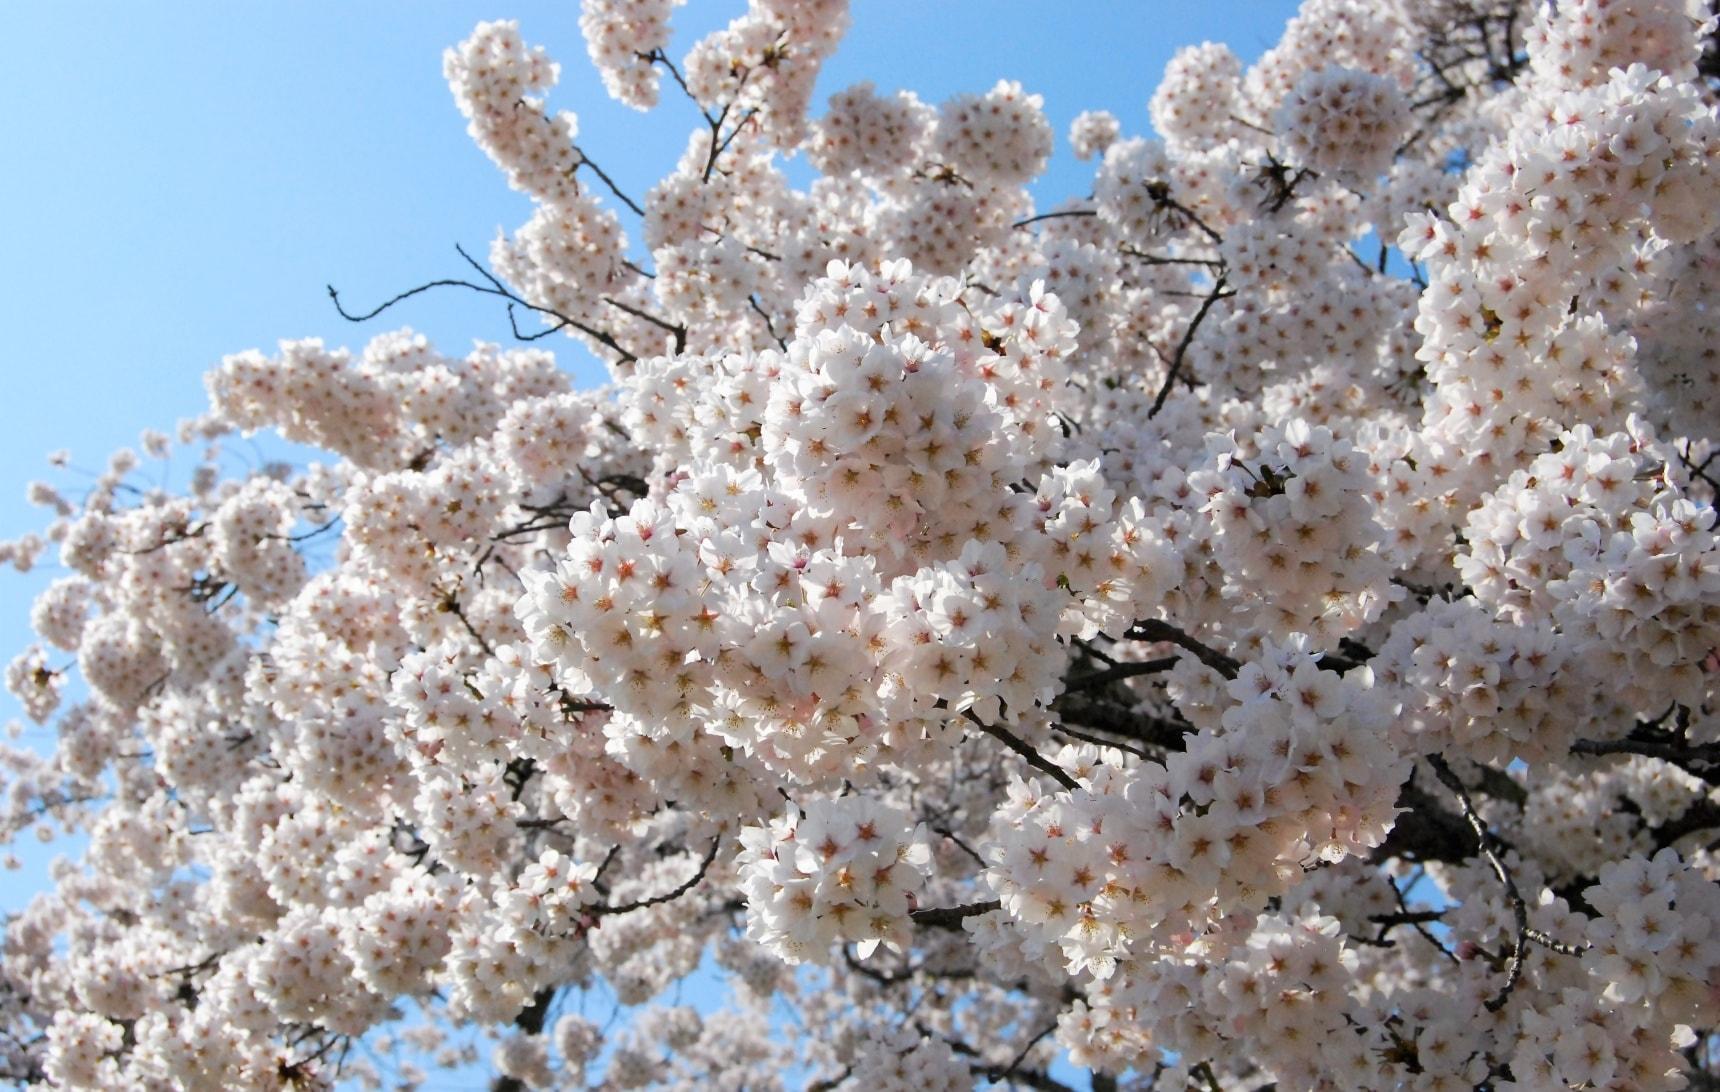 Tohoku's Late-Blooming Sakura Wonderland